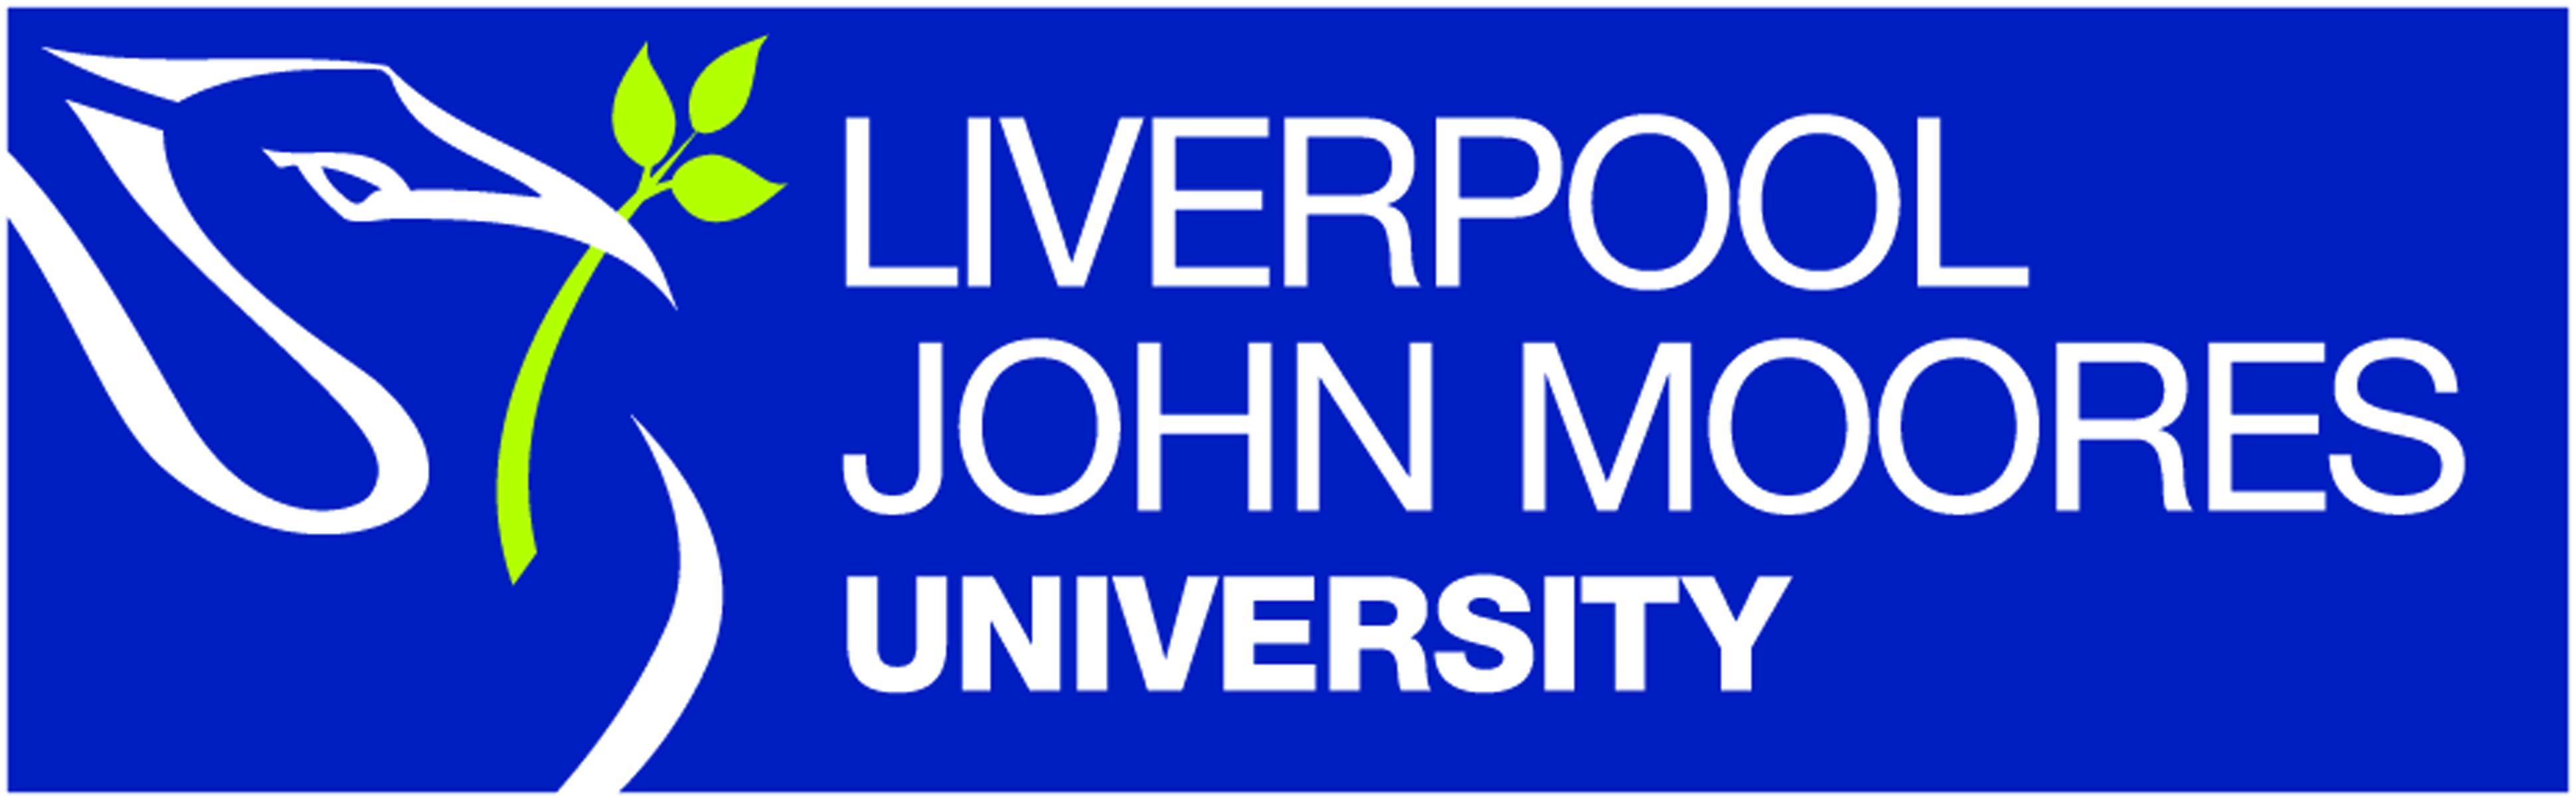 Liverpool John Moores University img-responsive